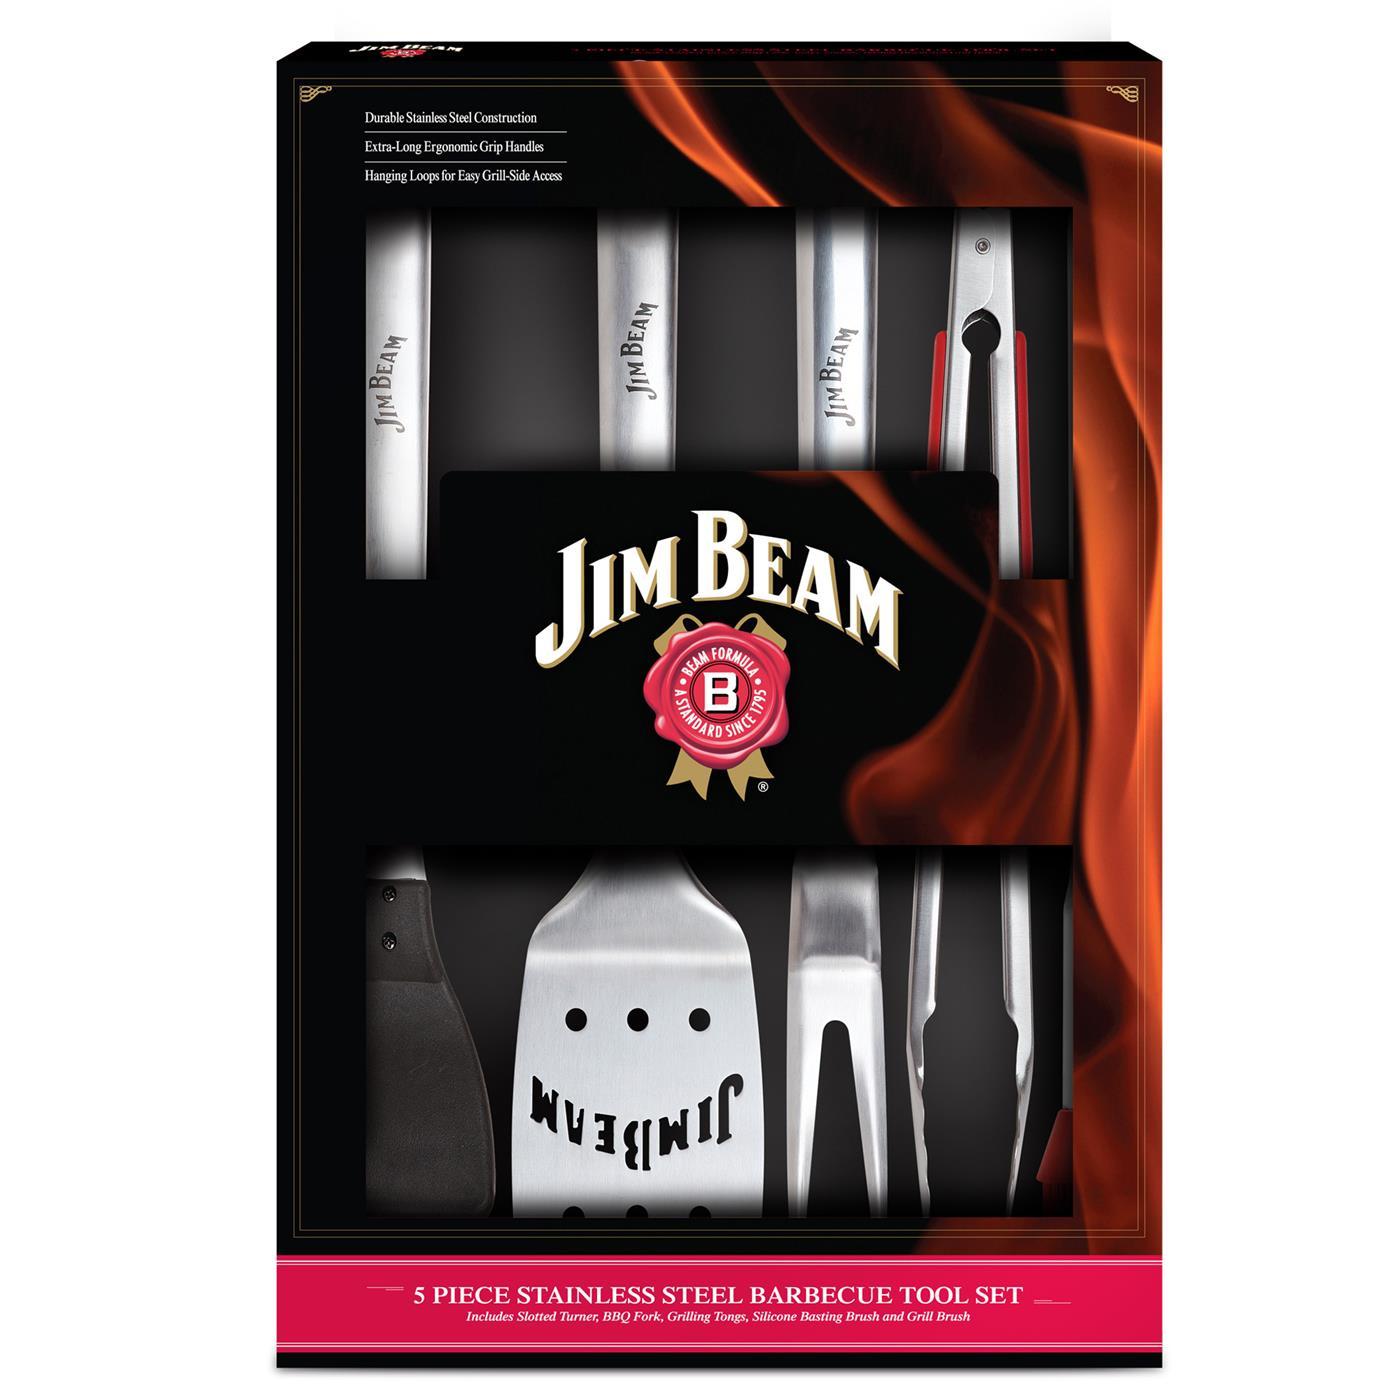 Jim Beam BBQ Grillbesteck Grillset Set 3tlg Grillzange Grillwender Grillbürste